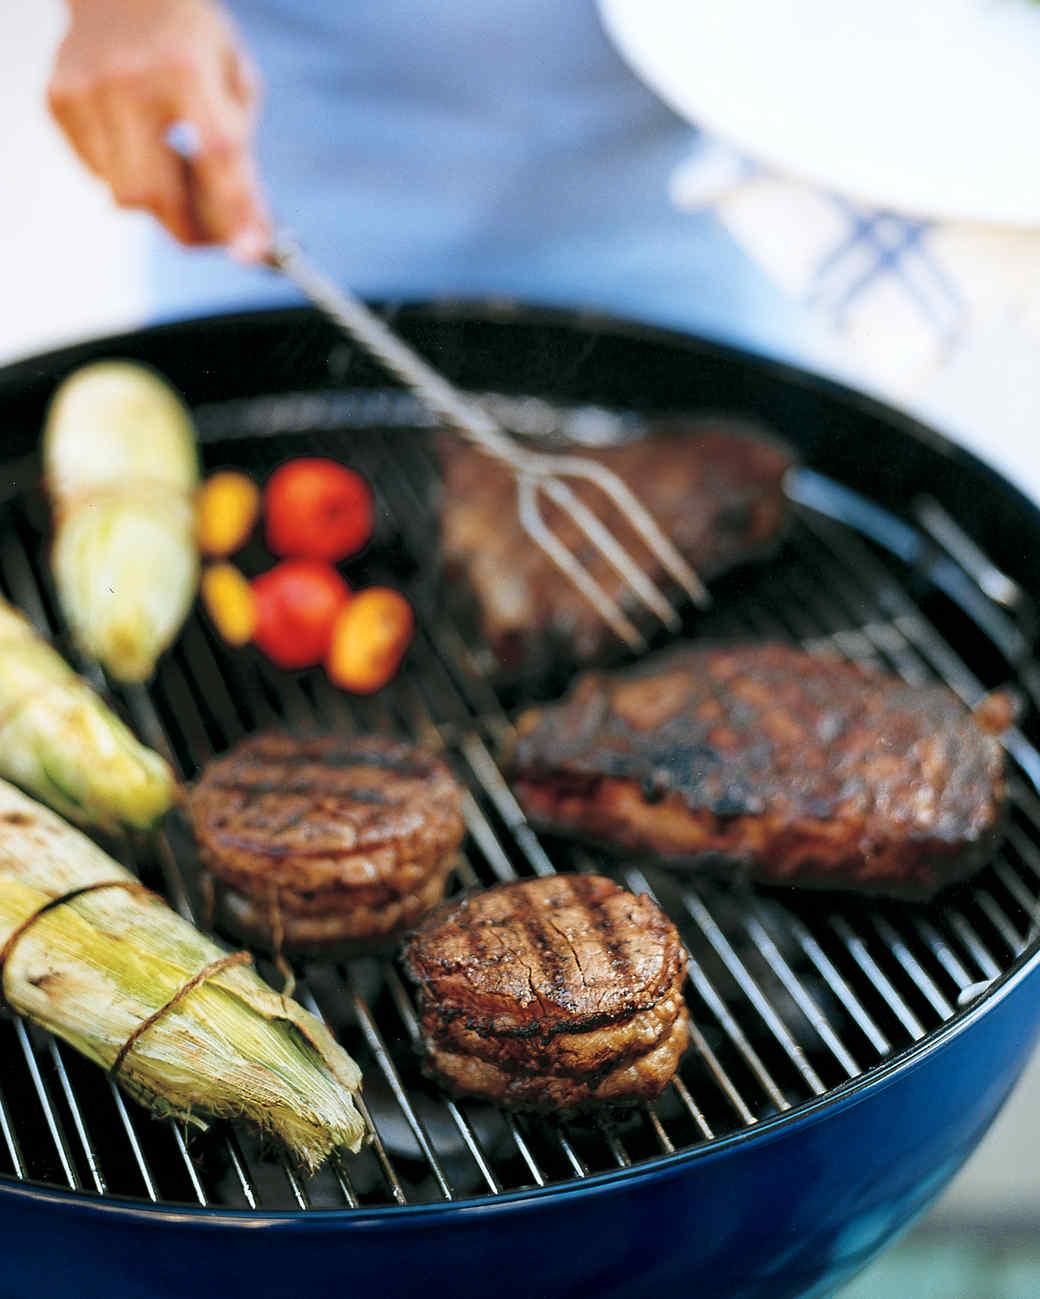 msl_jun06_grilled_steak.jpg